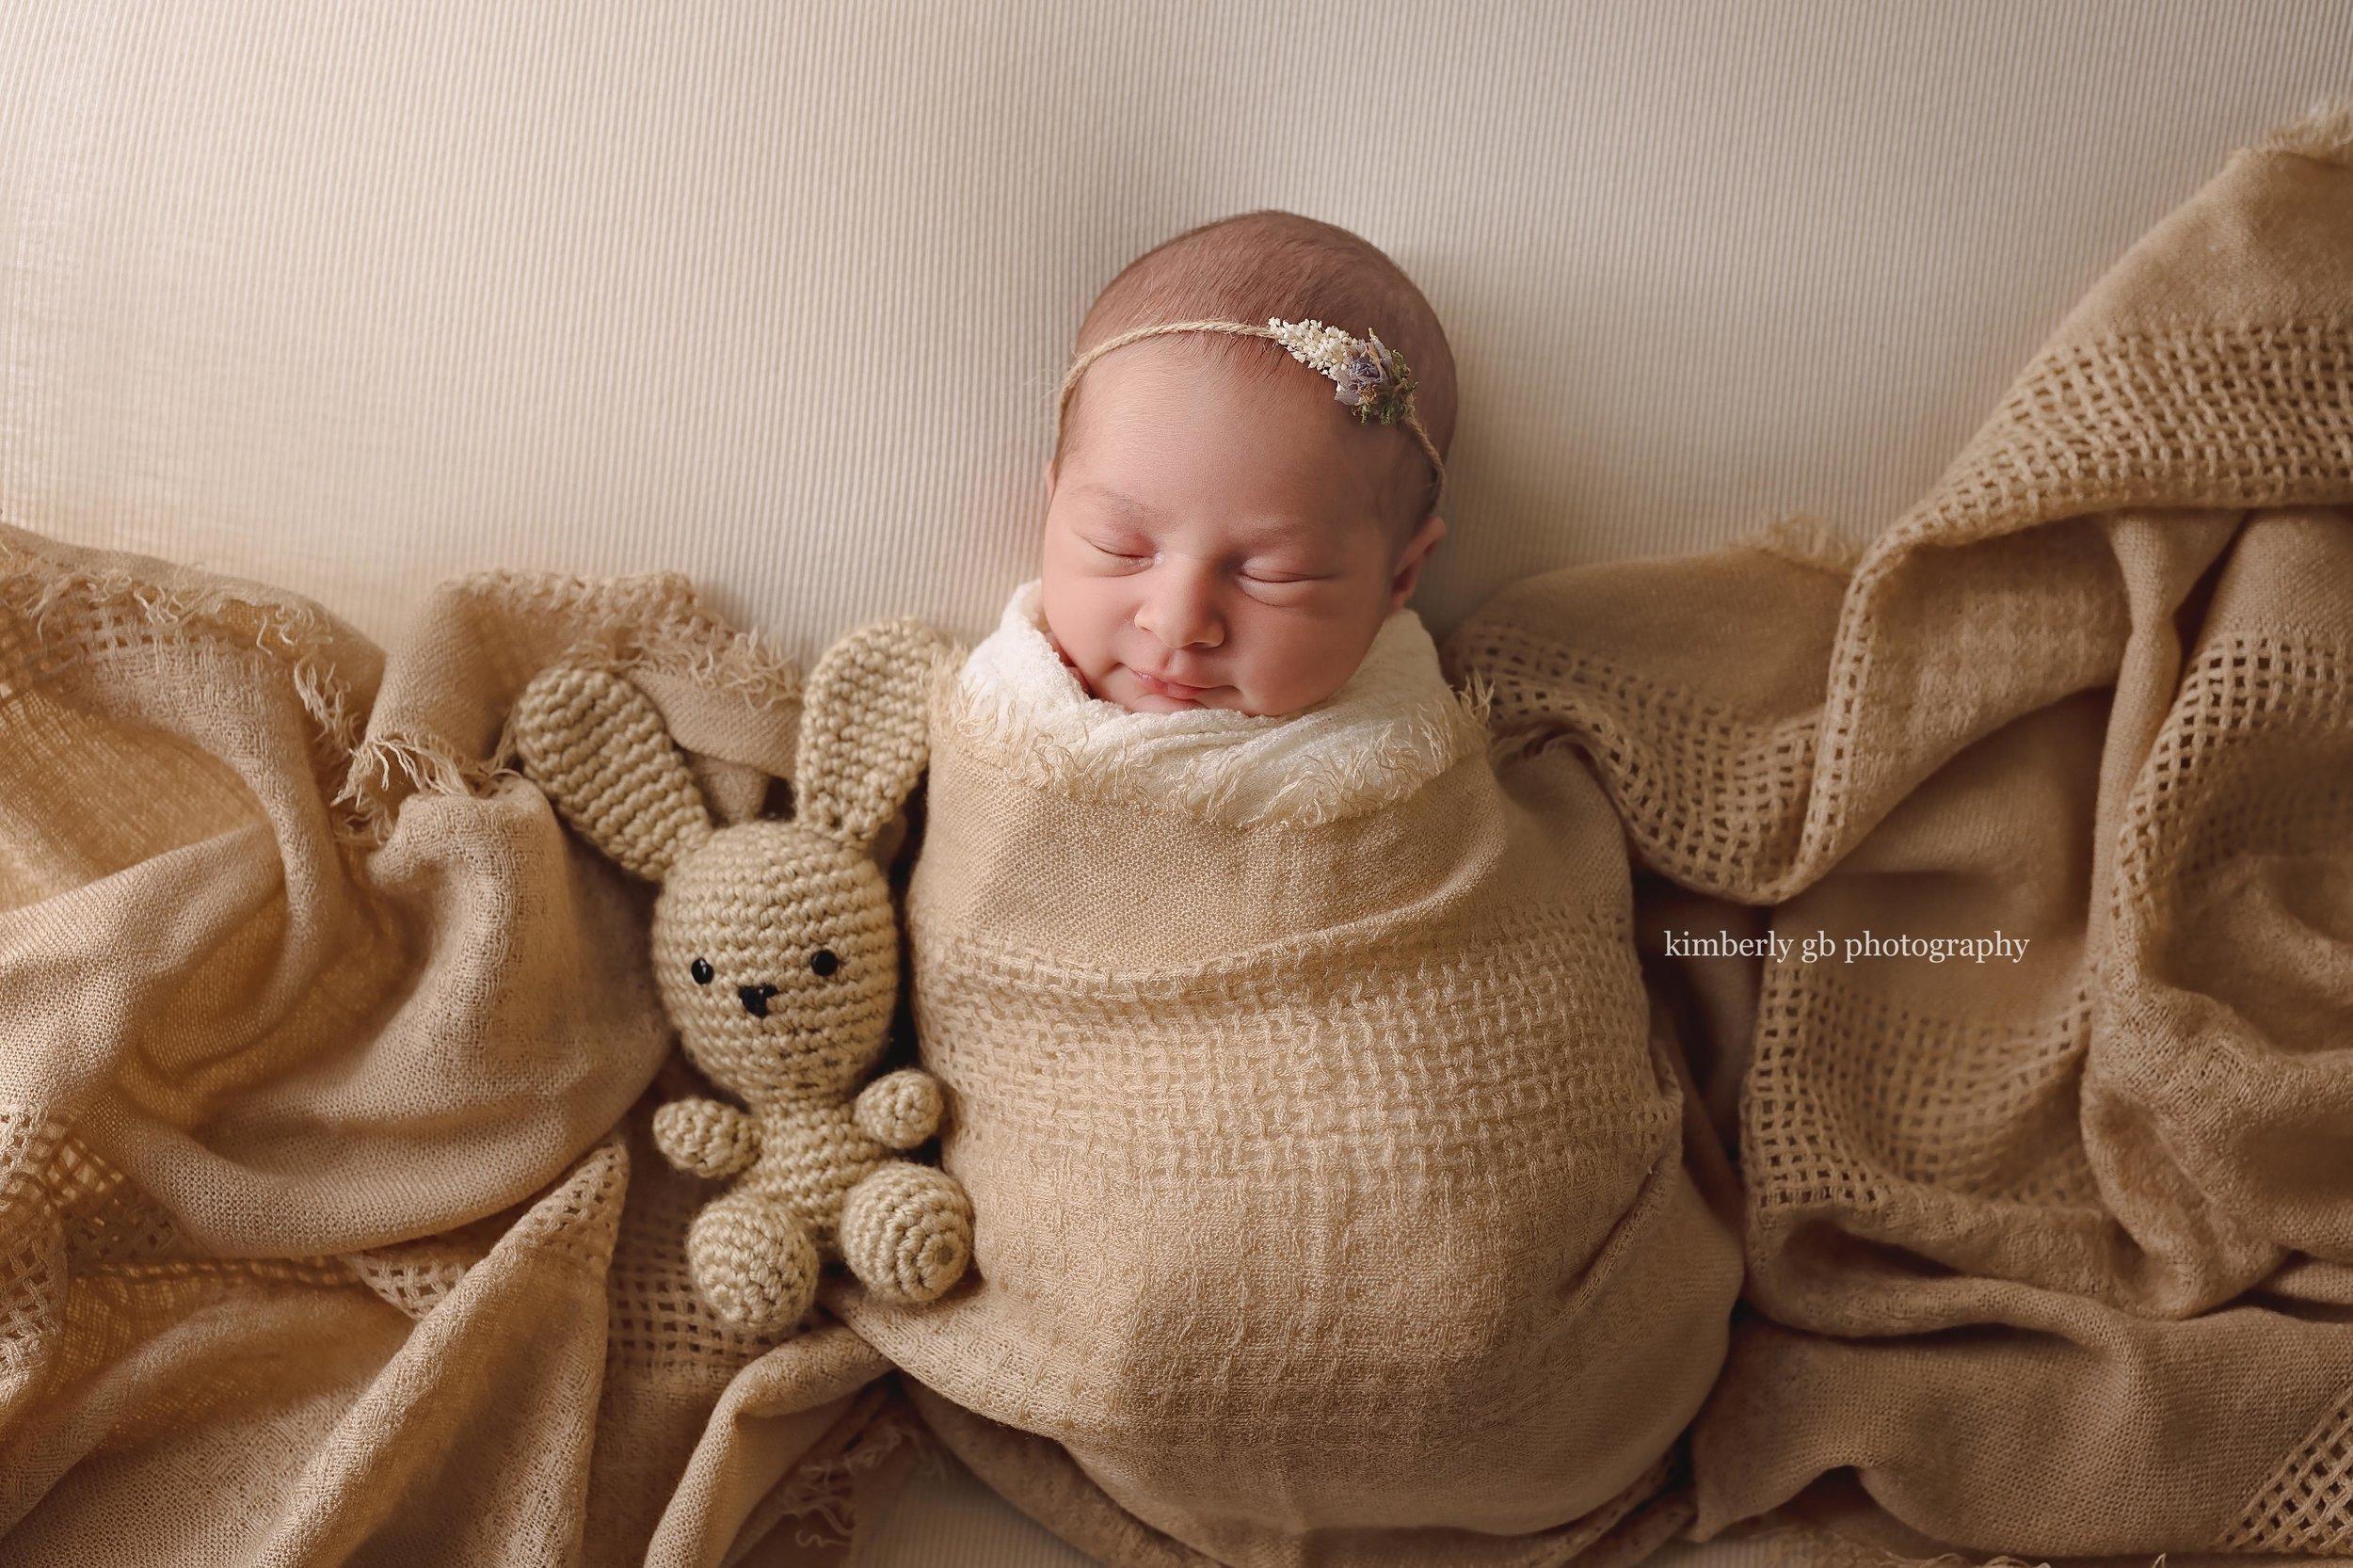 fotografia-de-recien-nacidos-bebes-newborn-en-puerto-rico-kimberly-gb-photography-fotografa-304.jpg